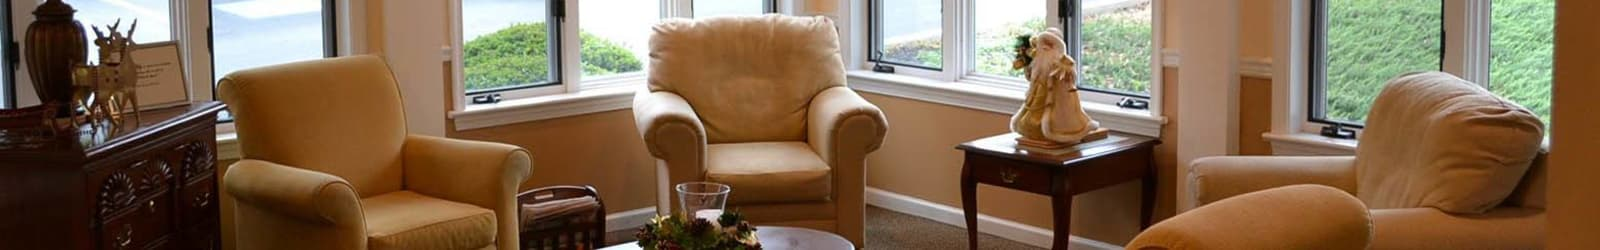 Senior living options at the senior living community in Chattanooga